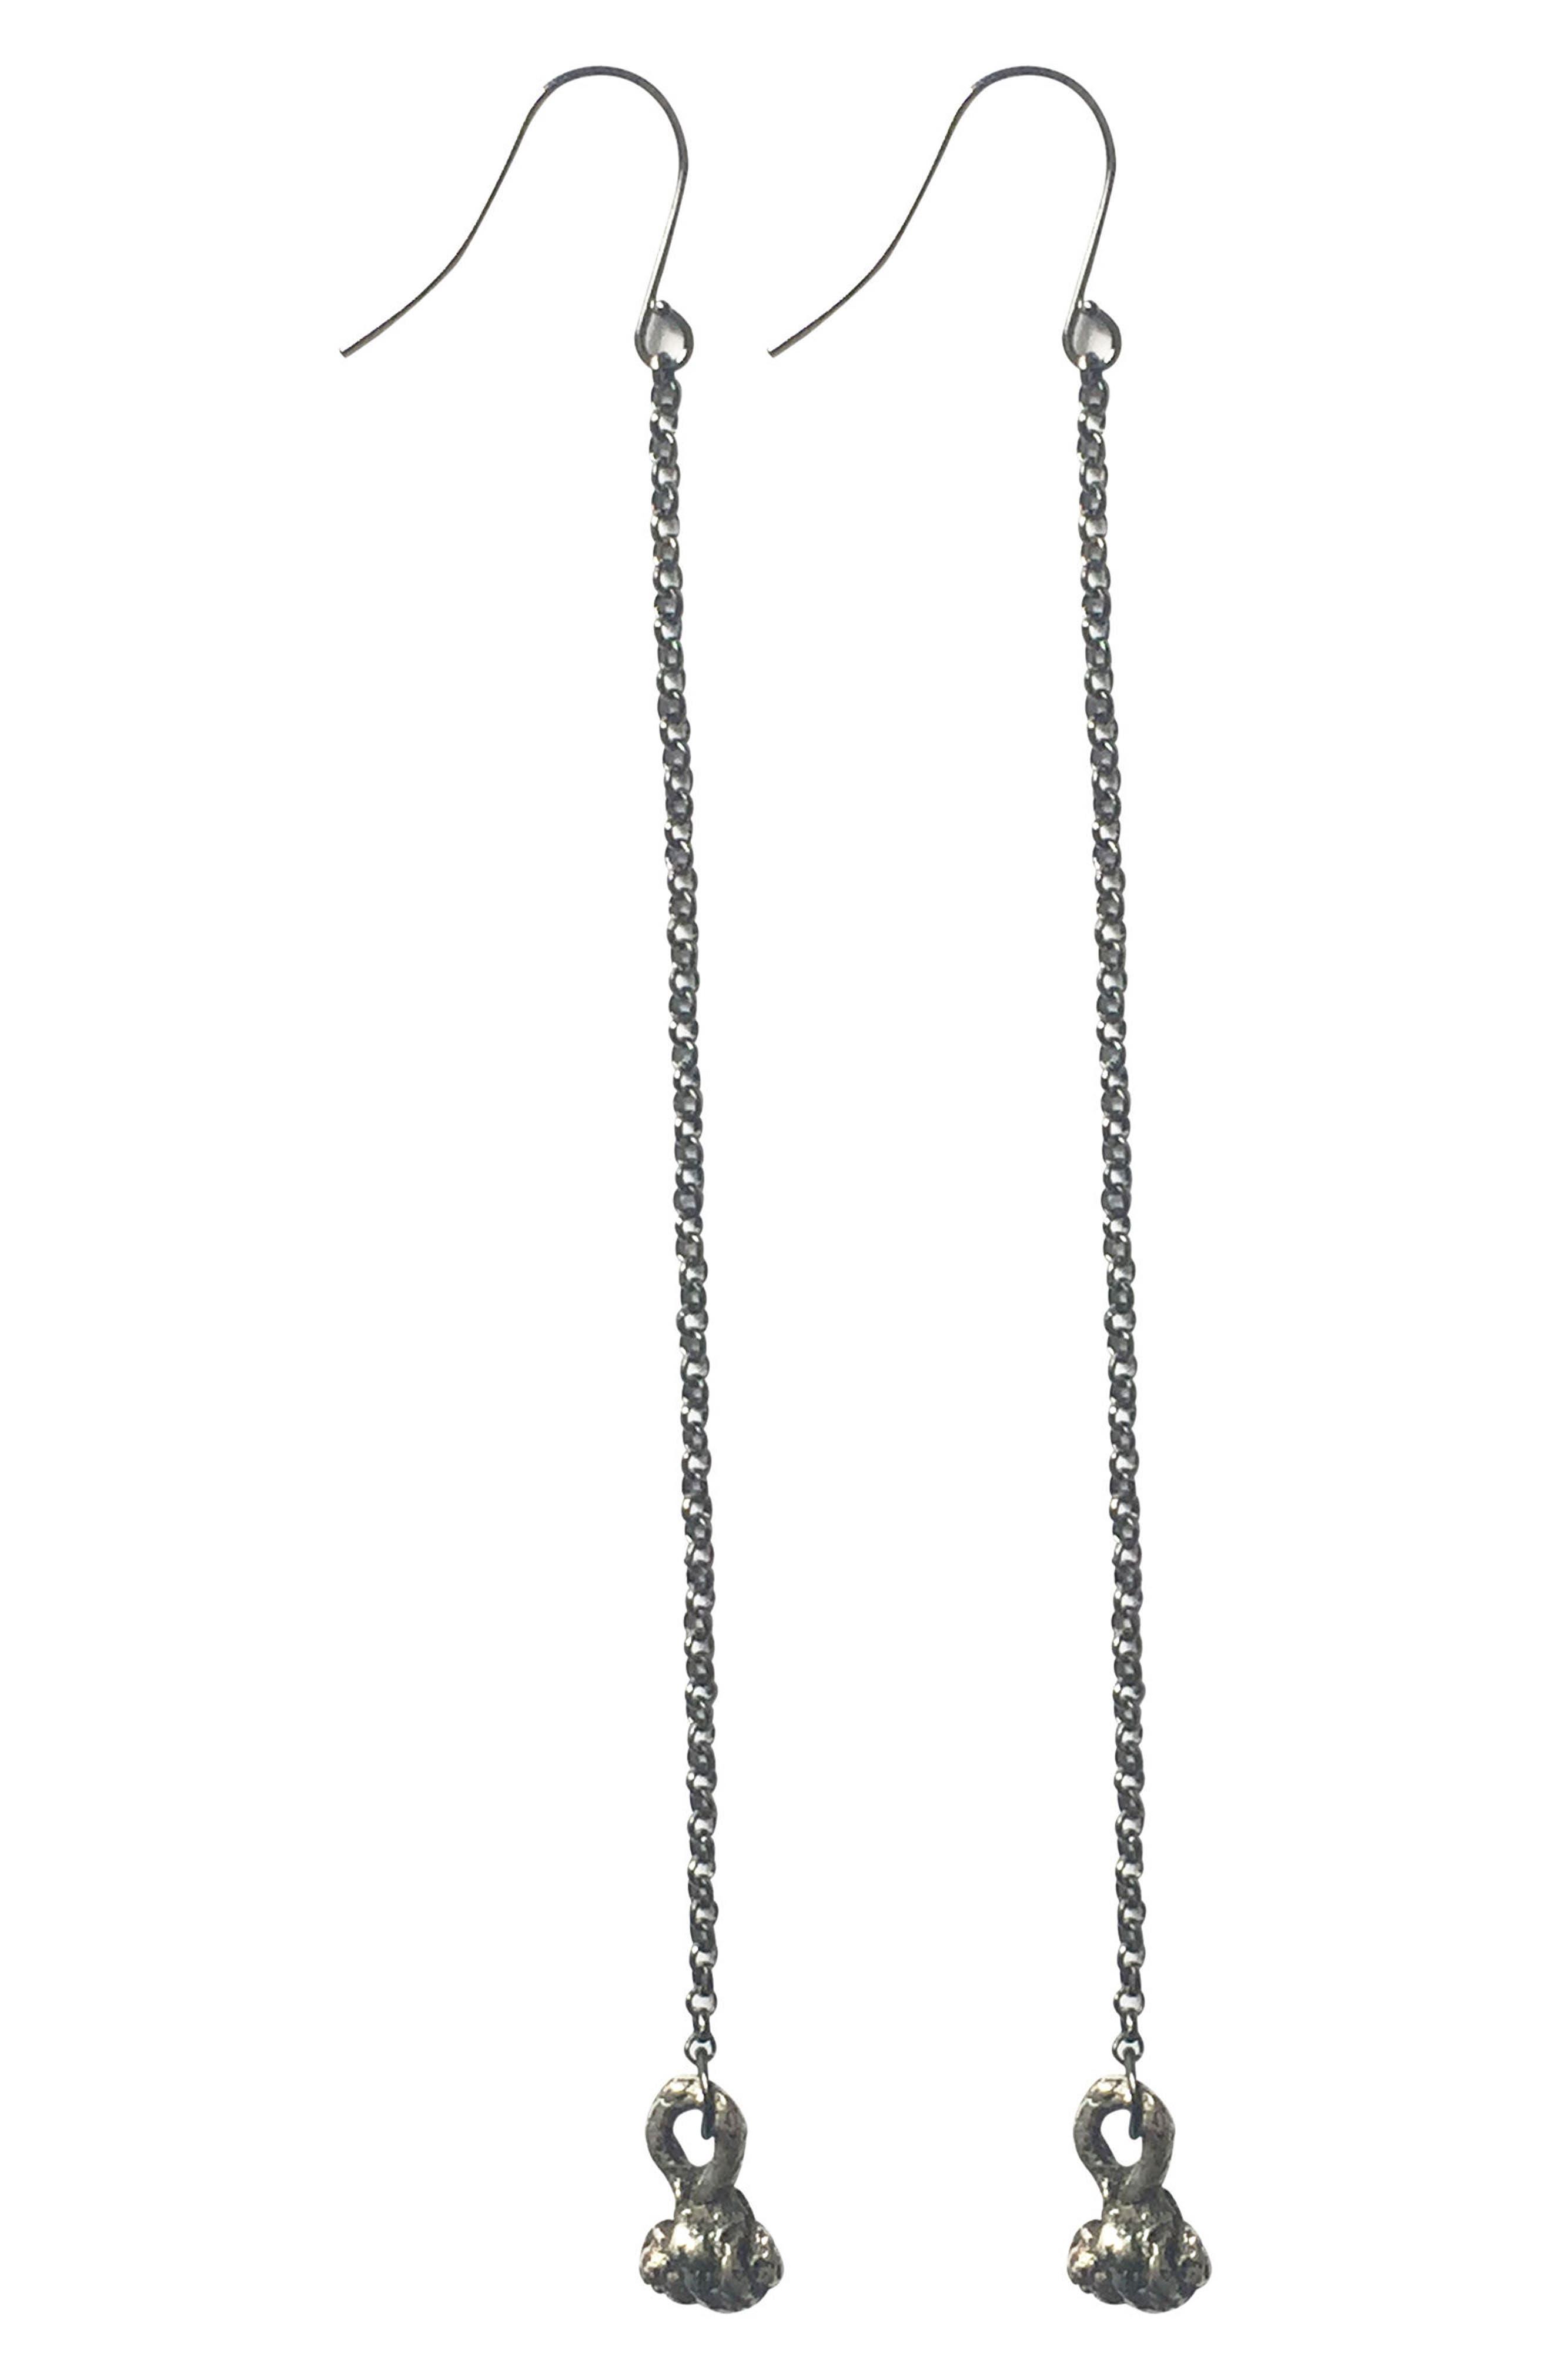 Chain Drop Earrings,                             Main thumbnail 1, color,                             040